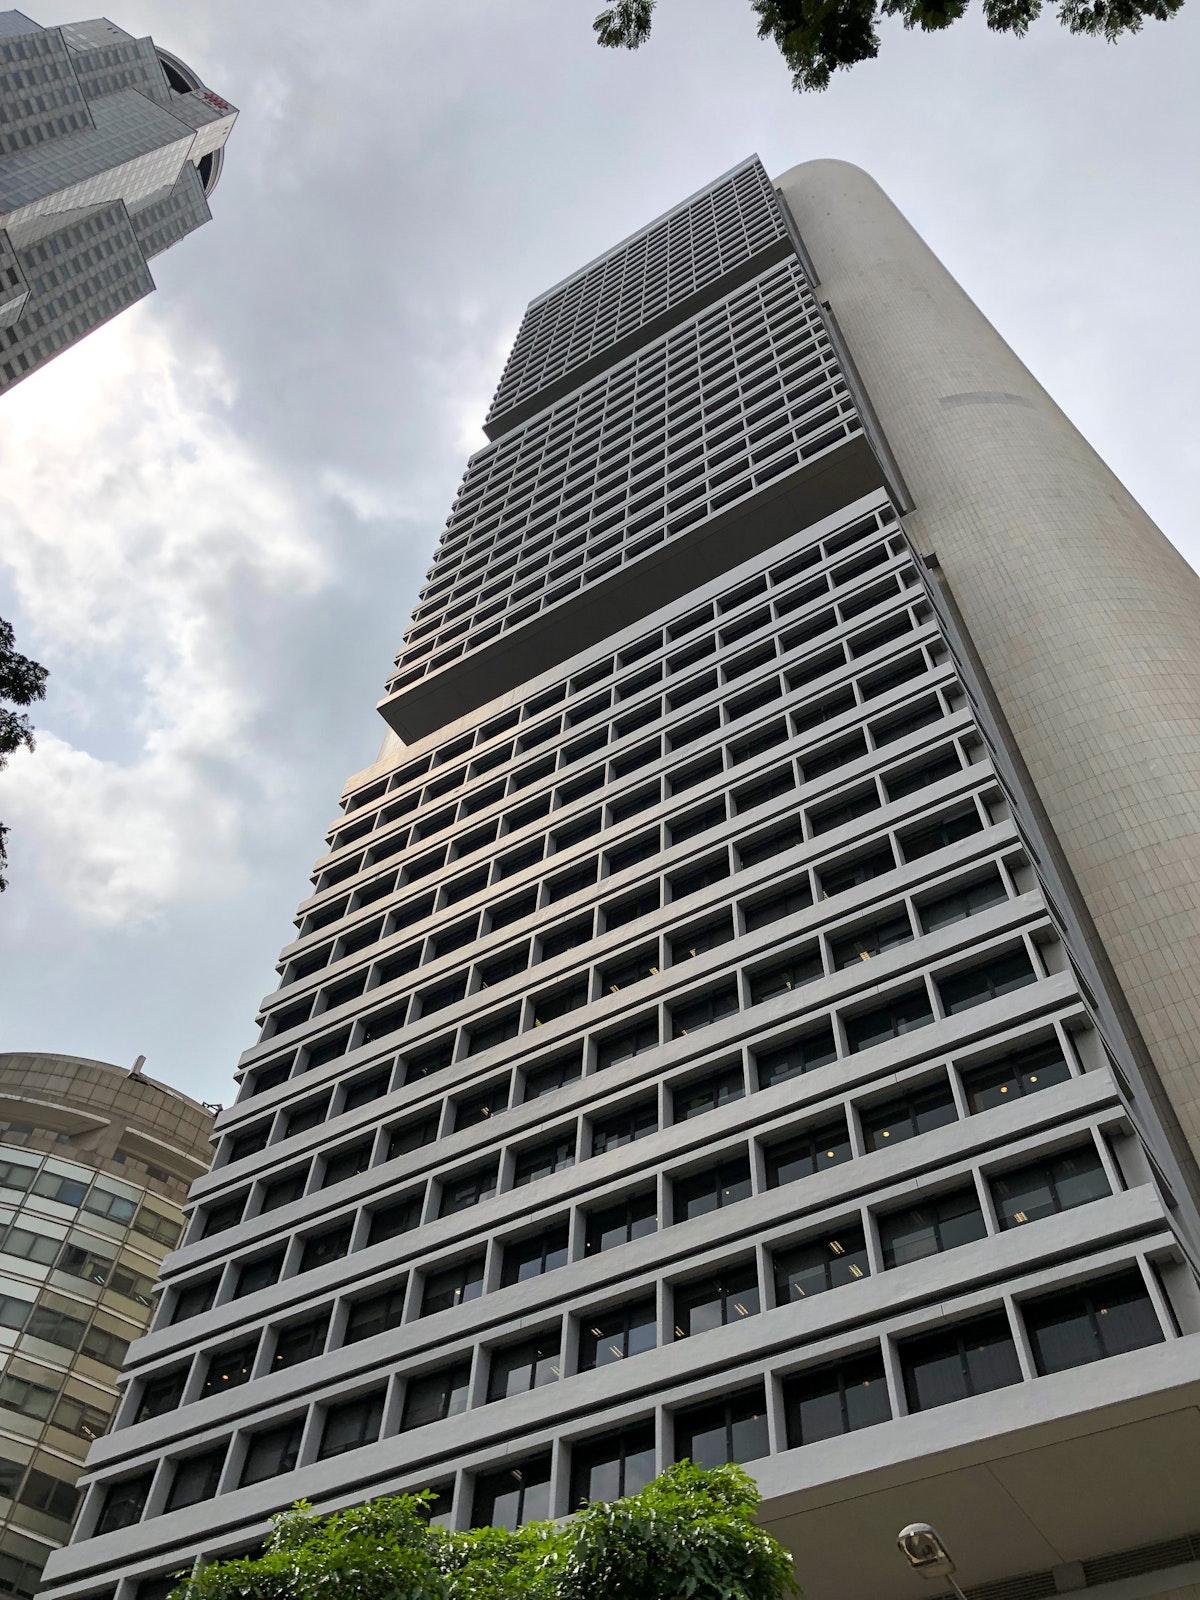 I.M. Pei's crazy OCB Building